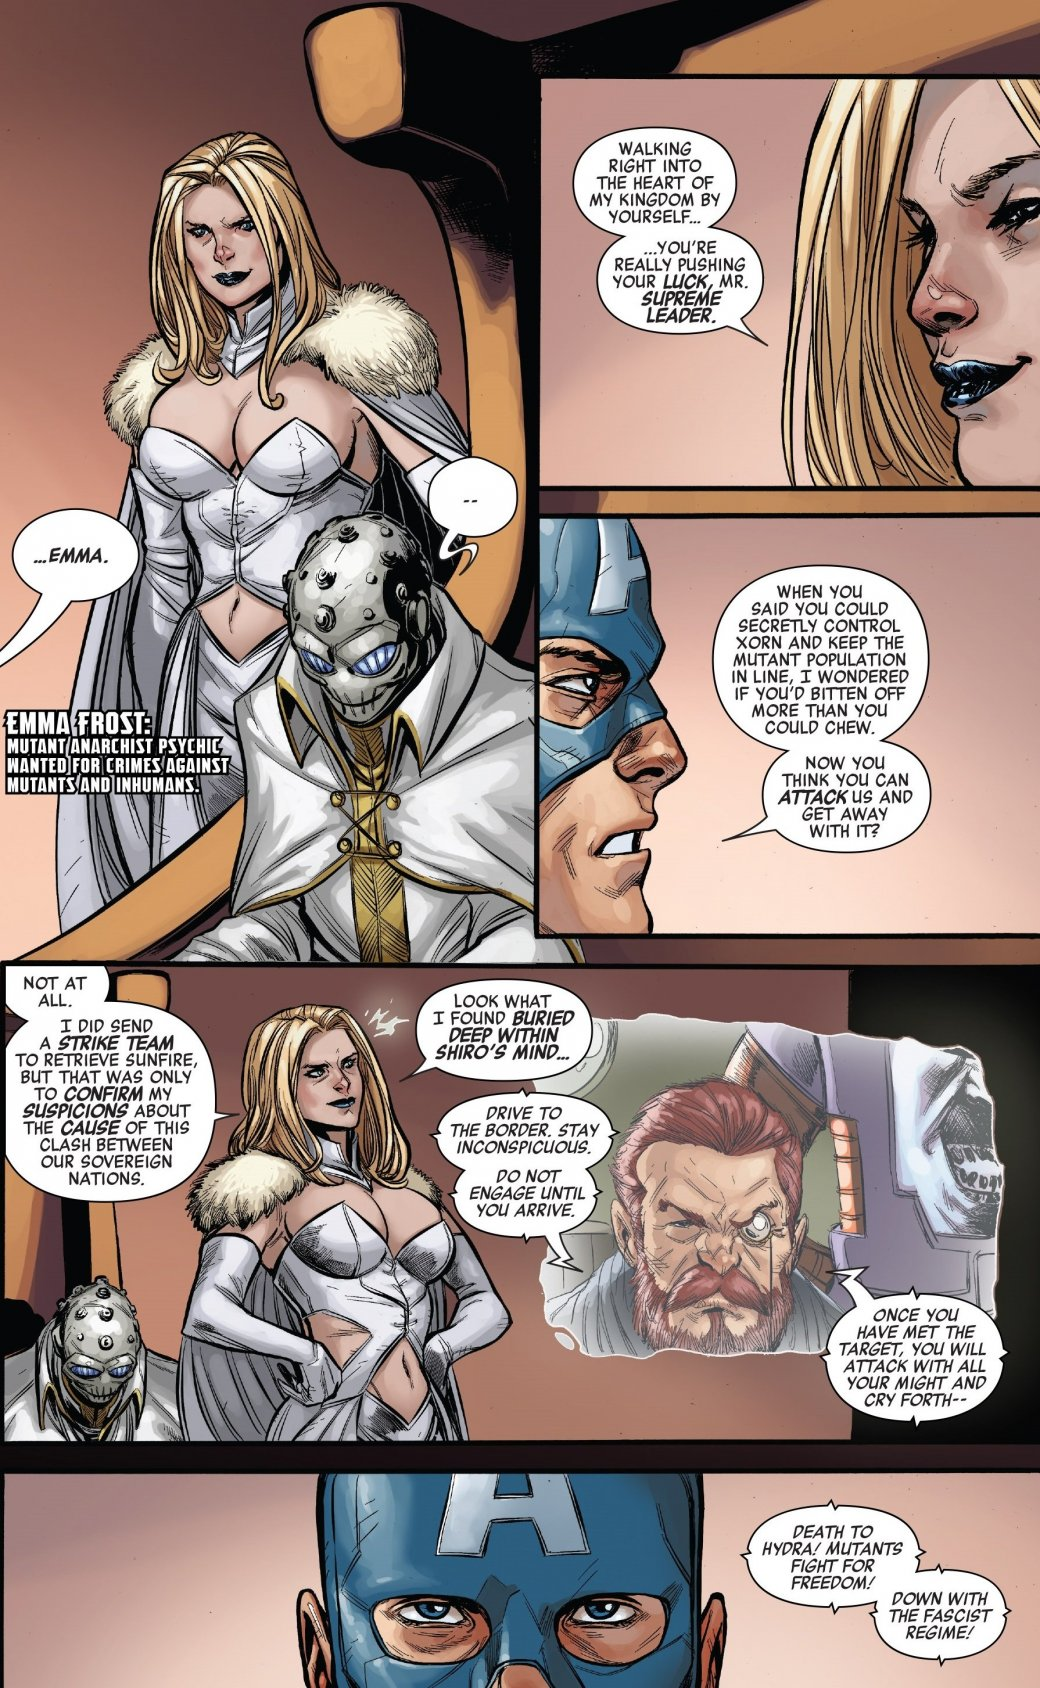 Secret Empire: противостоянию Стива Роджерса иТони Старка нет конца - Изображение 9